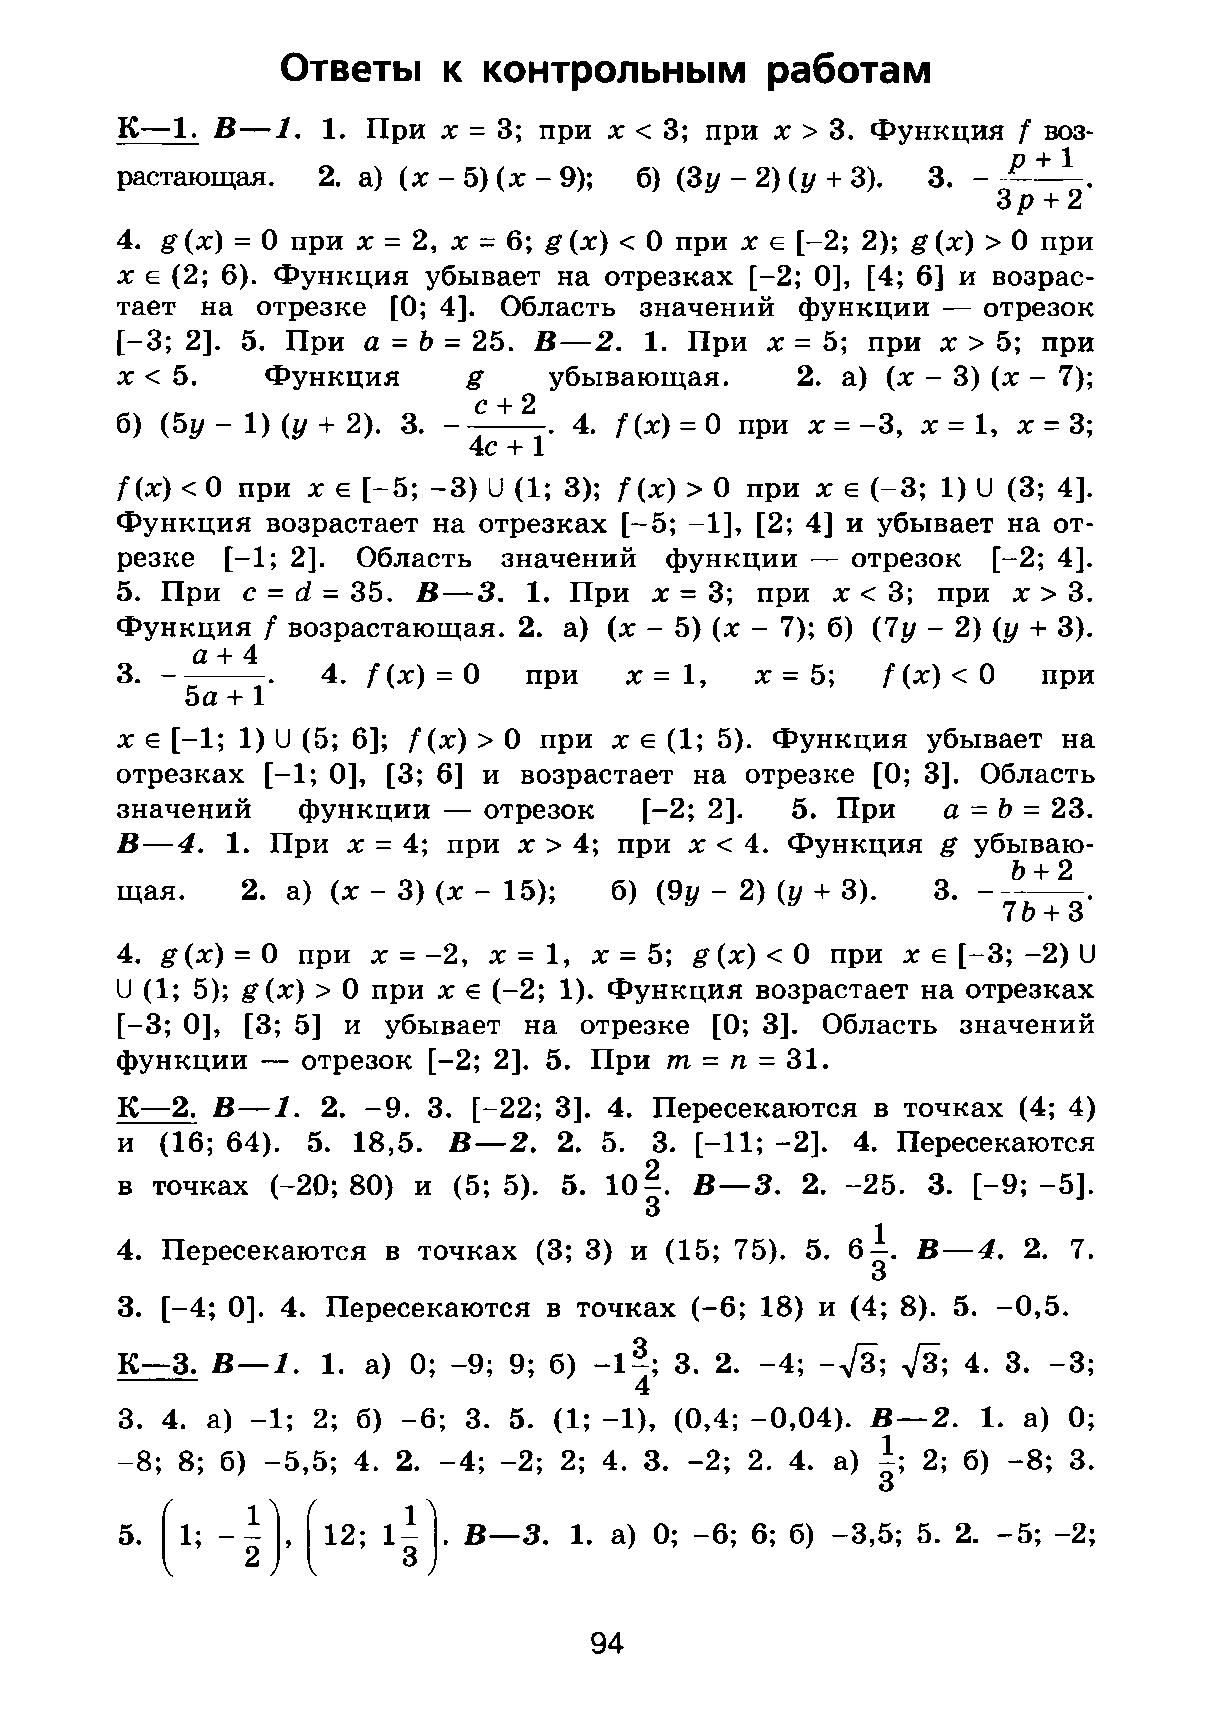 C:\Users\Винера\AppData\Local\Temp\HamsterArc{0d67d1a2-fbc1-469f-a724-3e1c75abf8fb}\Алг 9кл Ответы 1.png